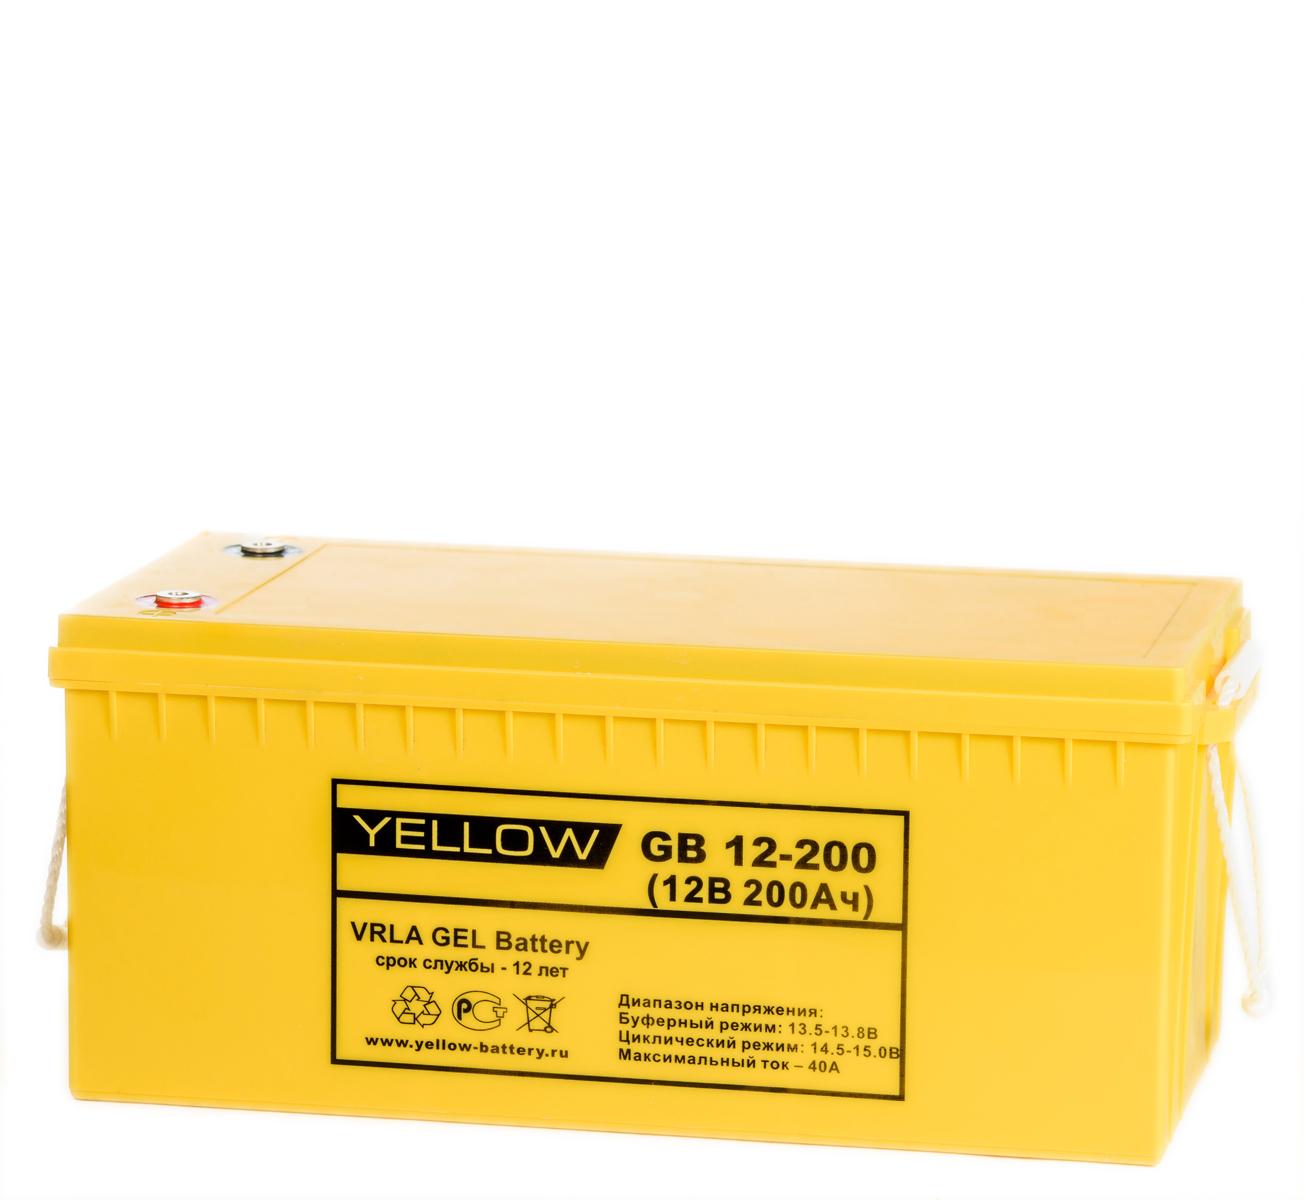 GB 12-200